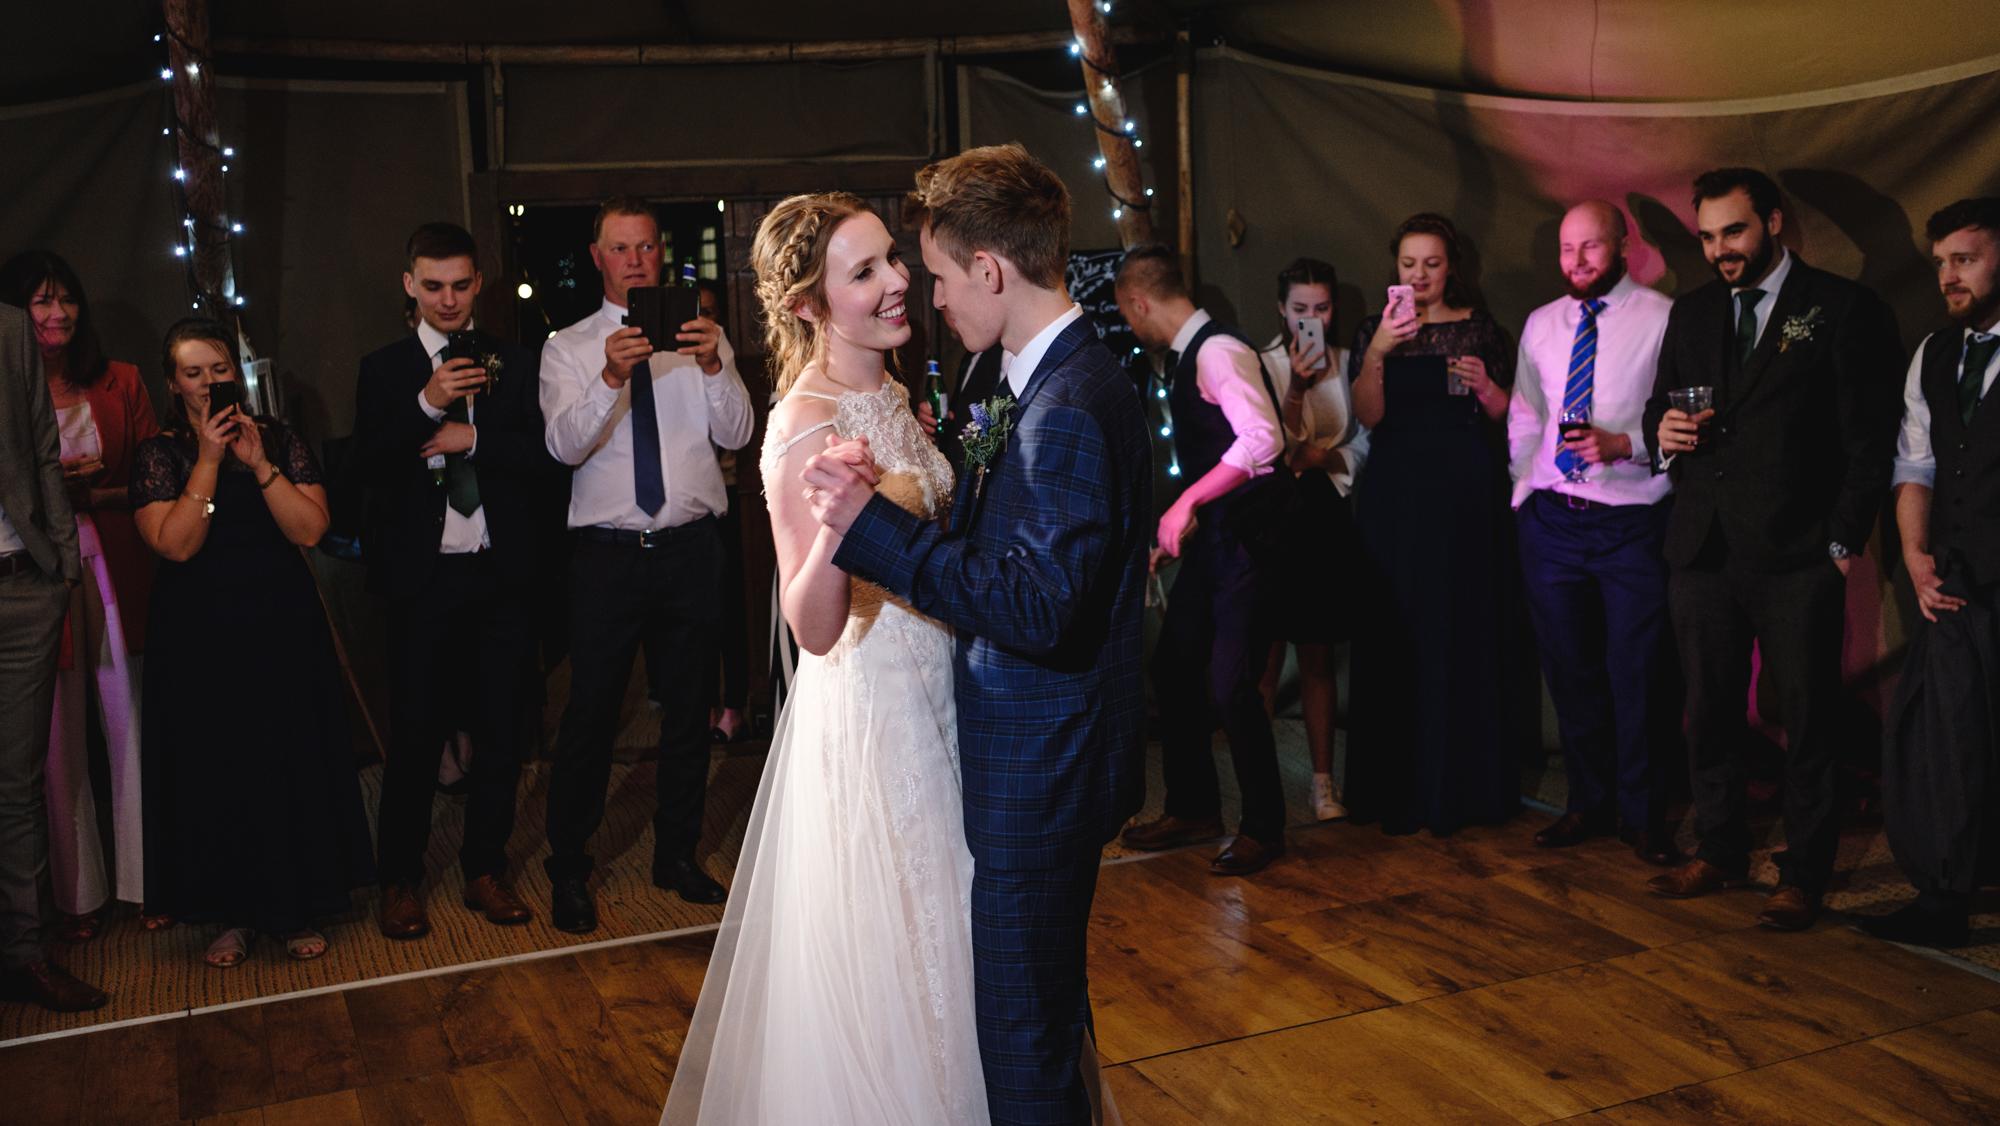 Katie and Dode weddings (191 of 207).jpg